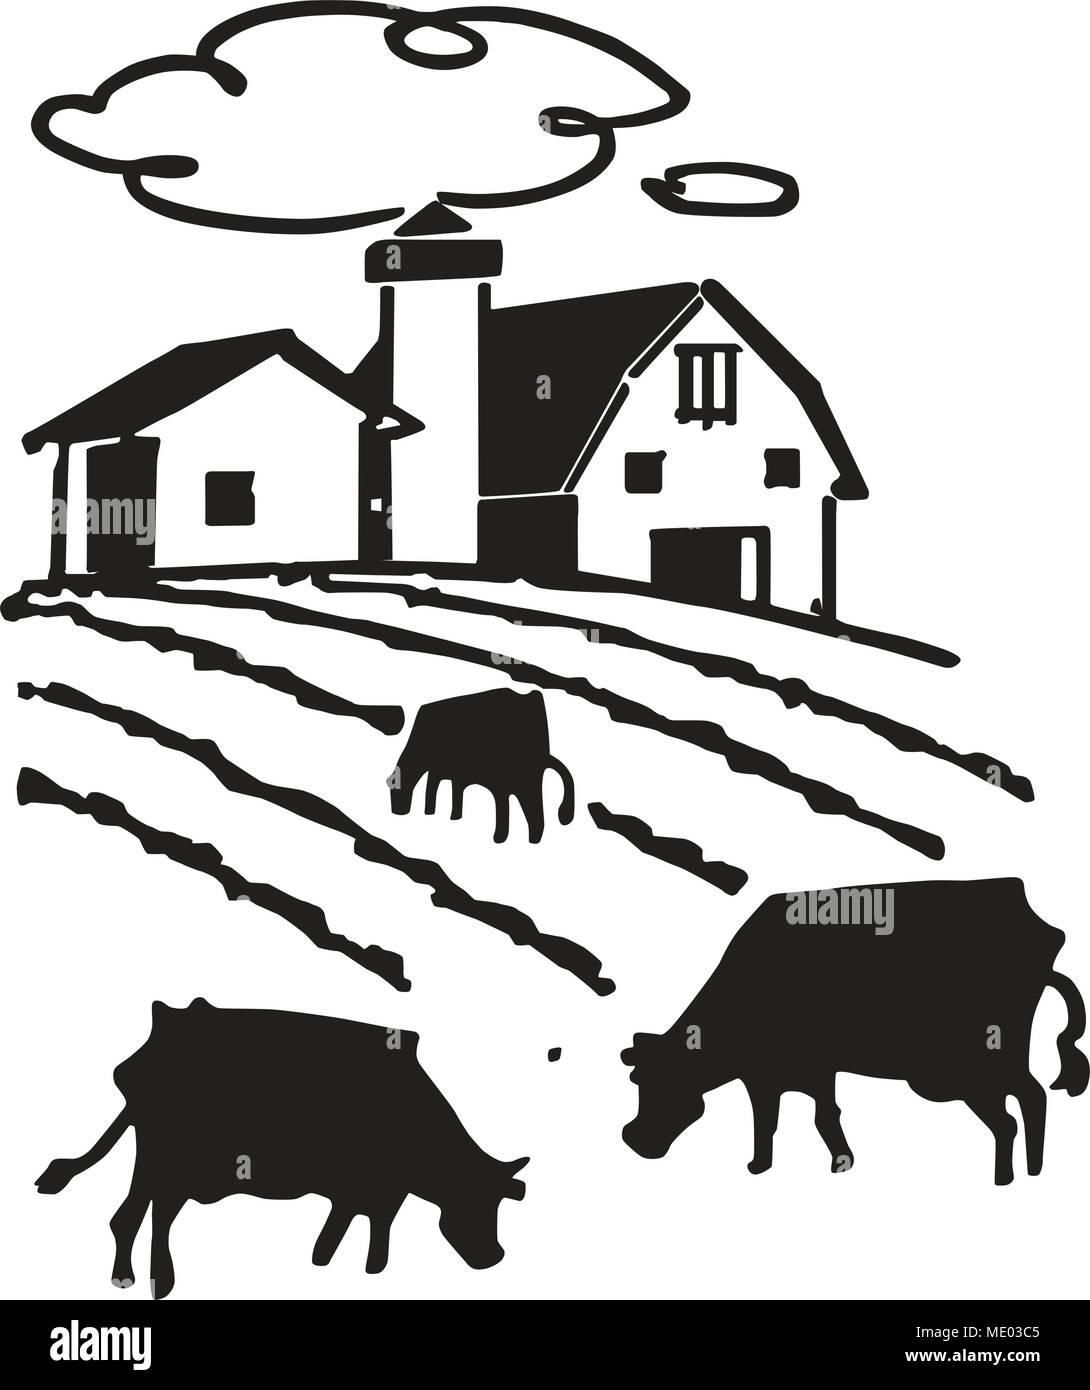 Grasende Kühe Auf Dem Bauernhof Retro Clipart Illustration Vektor